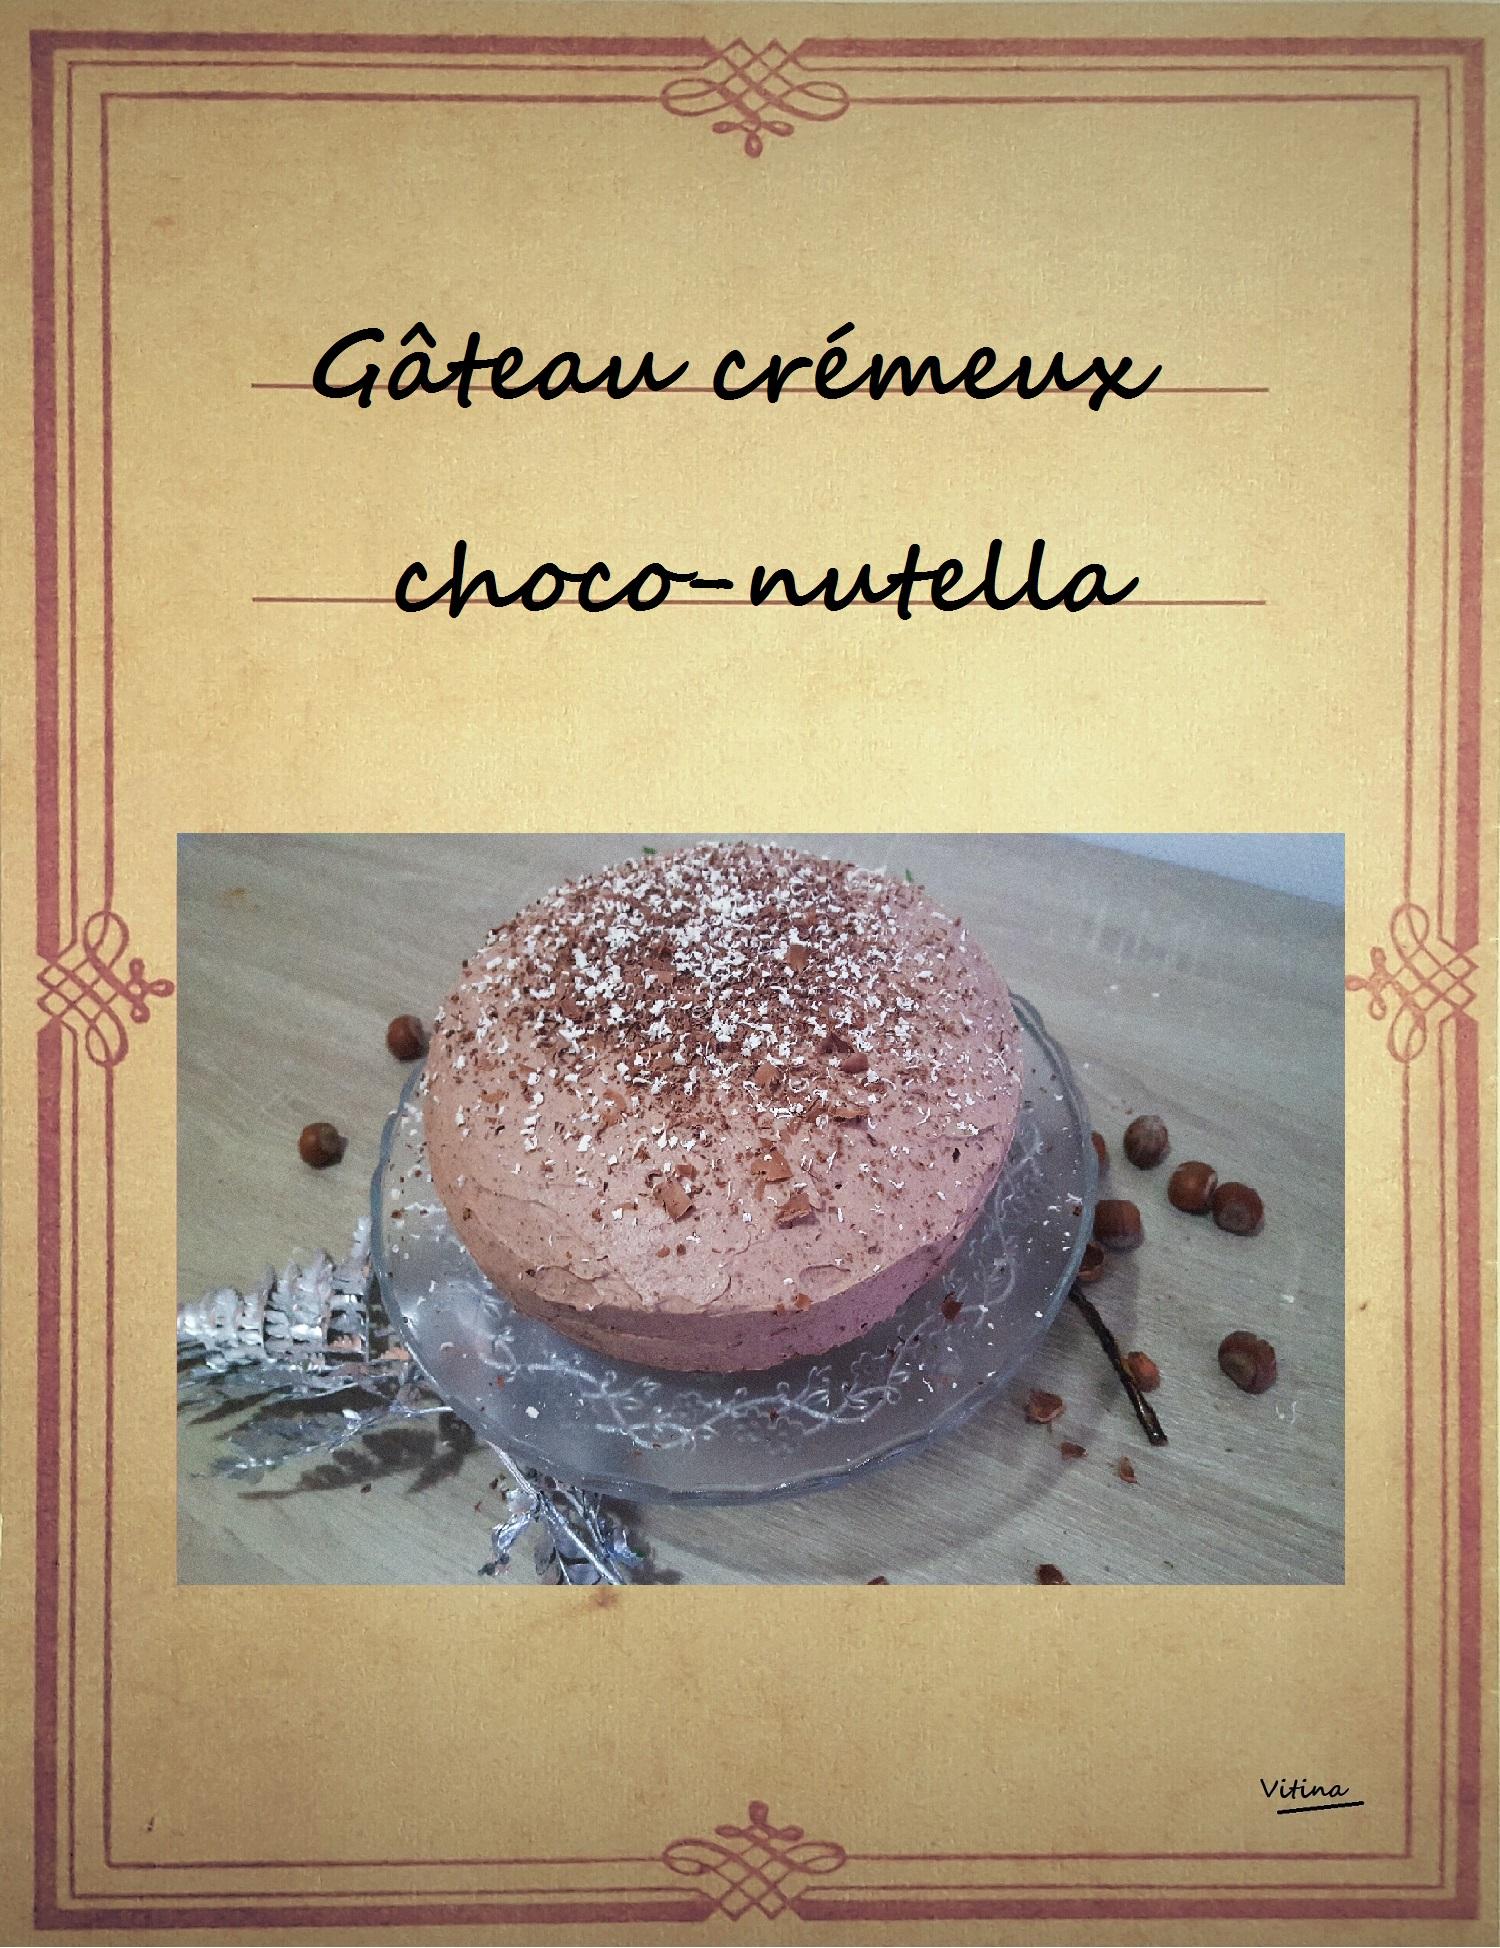 gateau-cremeux-choco-nutella